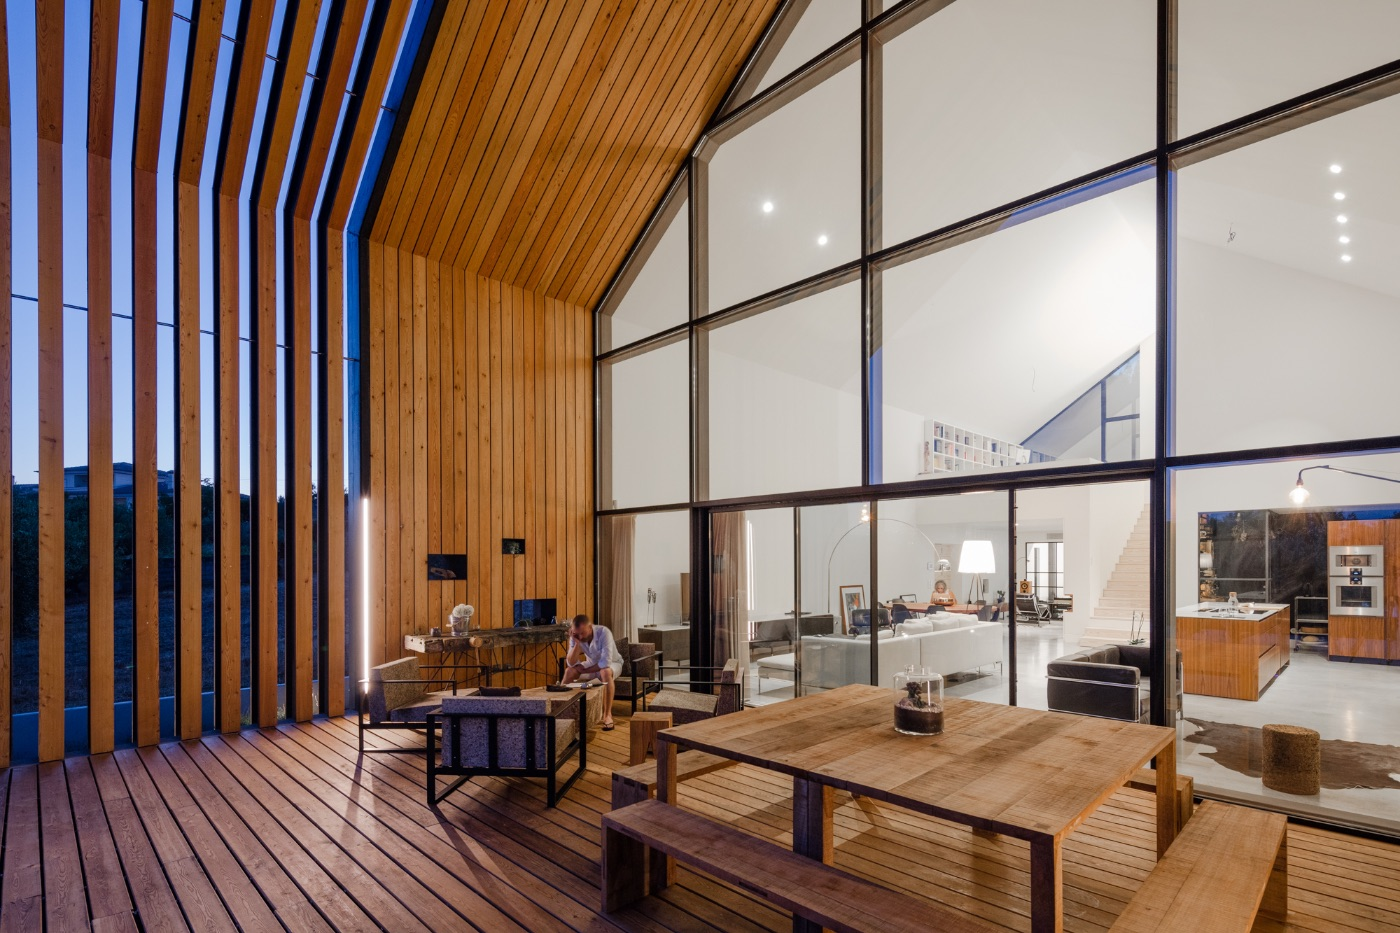 23_House in Ourem_Filipe Saraiva_Inspirationist